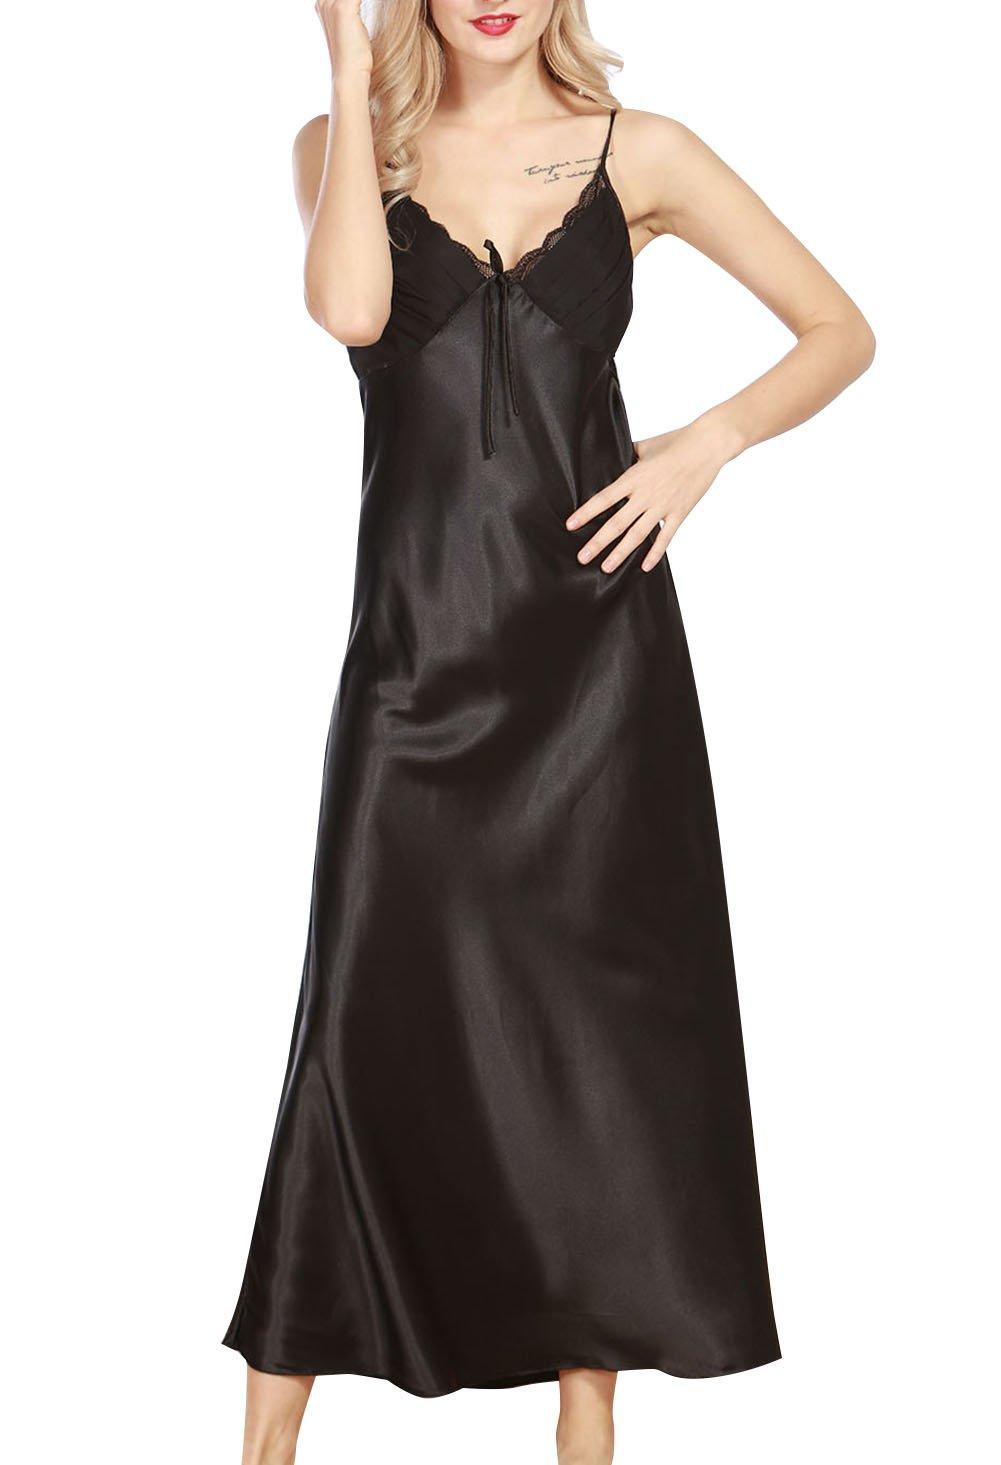 4Ping Women's Spring and Summer Imitation Silk Pajamas Long Paragraph Split Sexy Sling Sleep Dress Black L